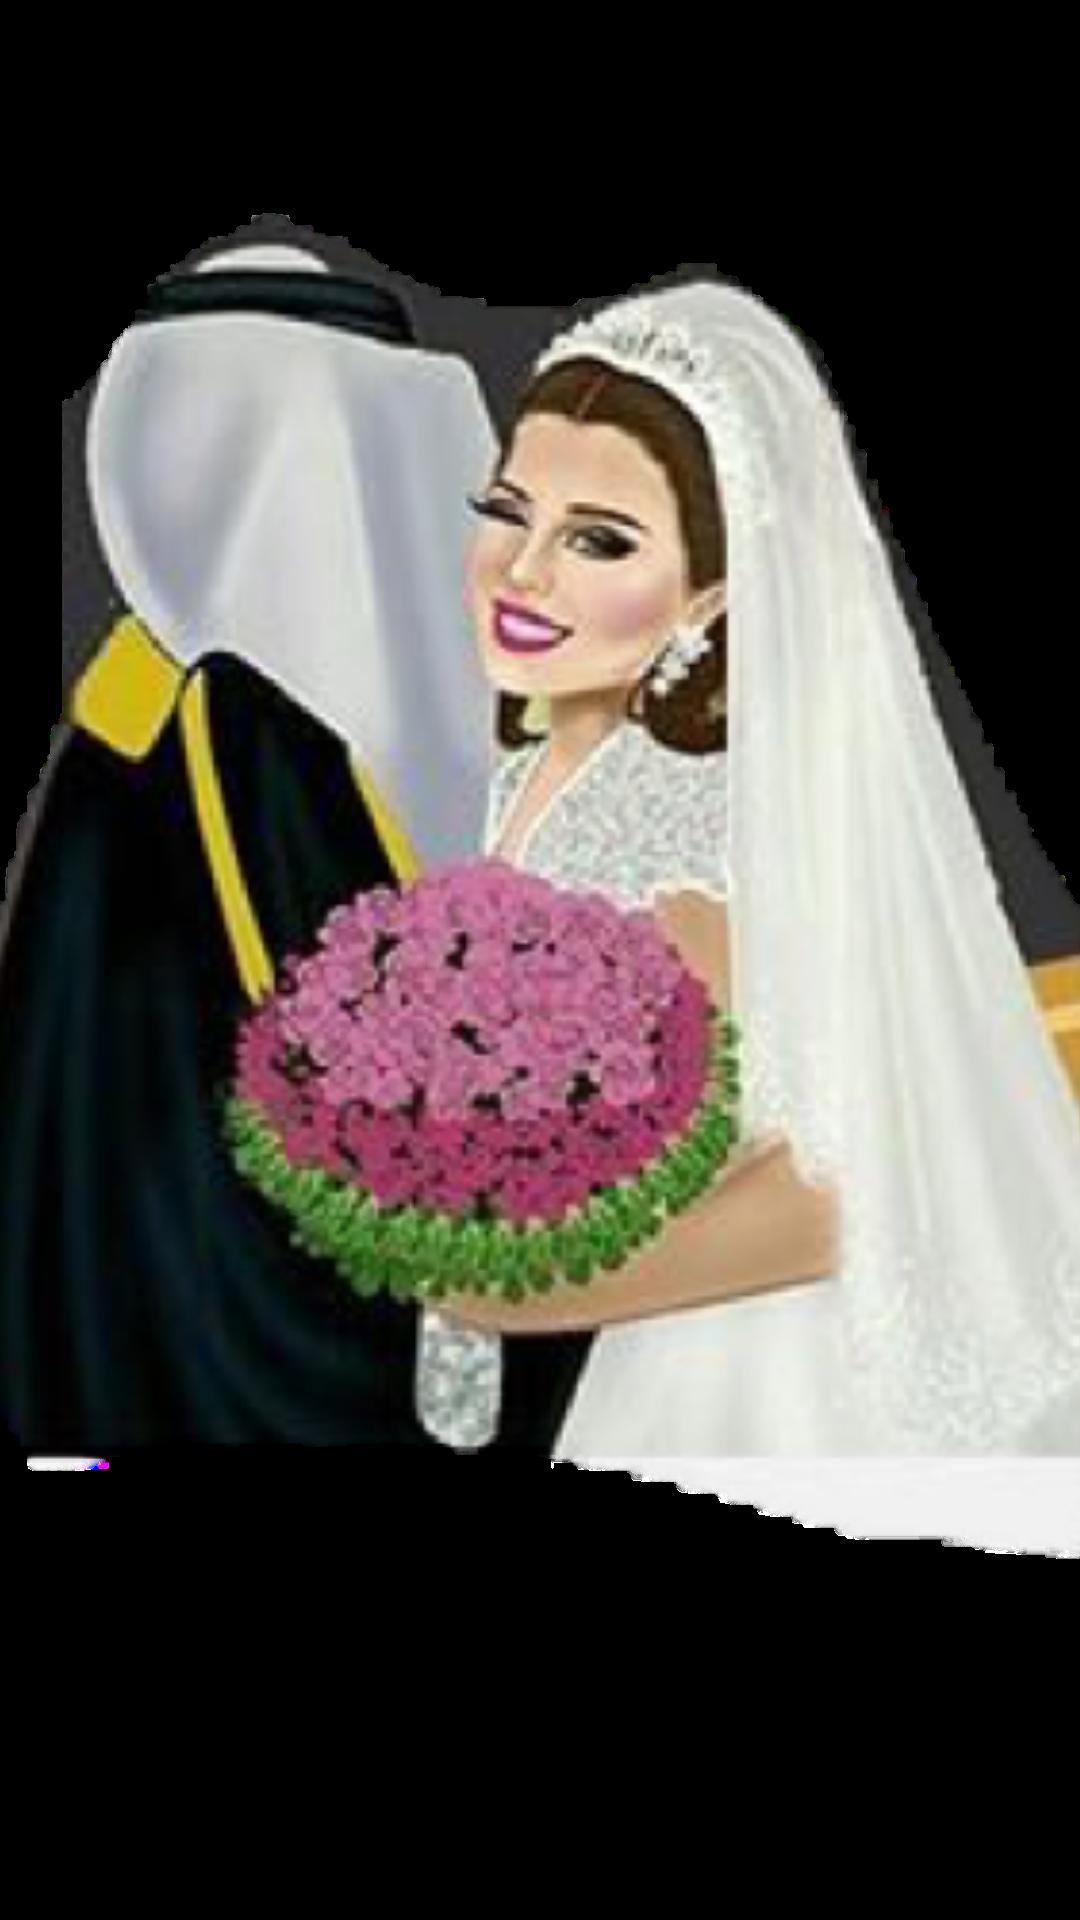 Pin By Amal Ahmed On Animation Wedding Illustration Valentine Wedding Card Wedding Theme Colors